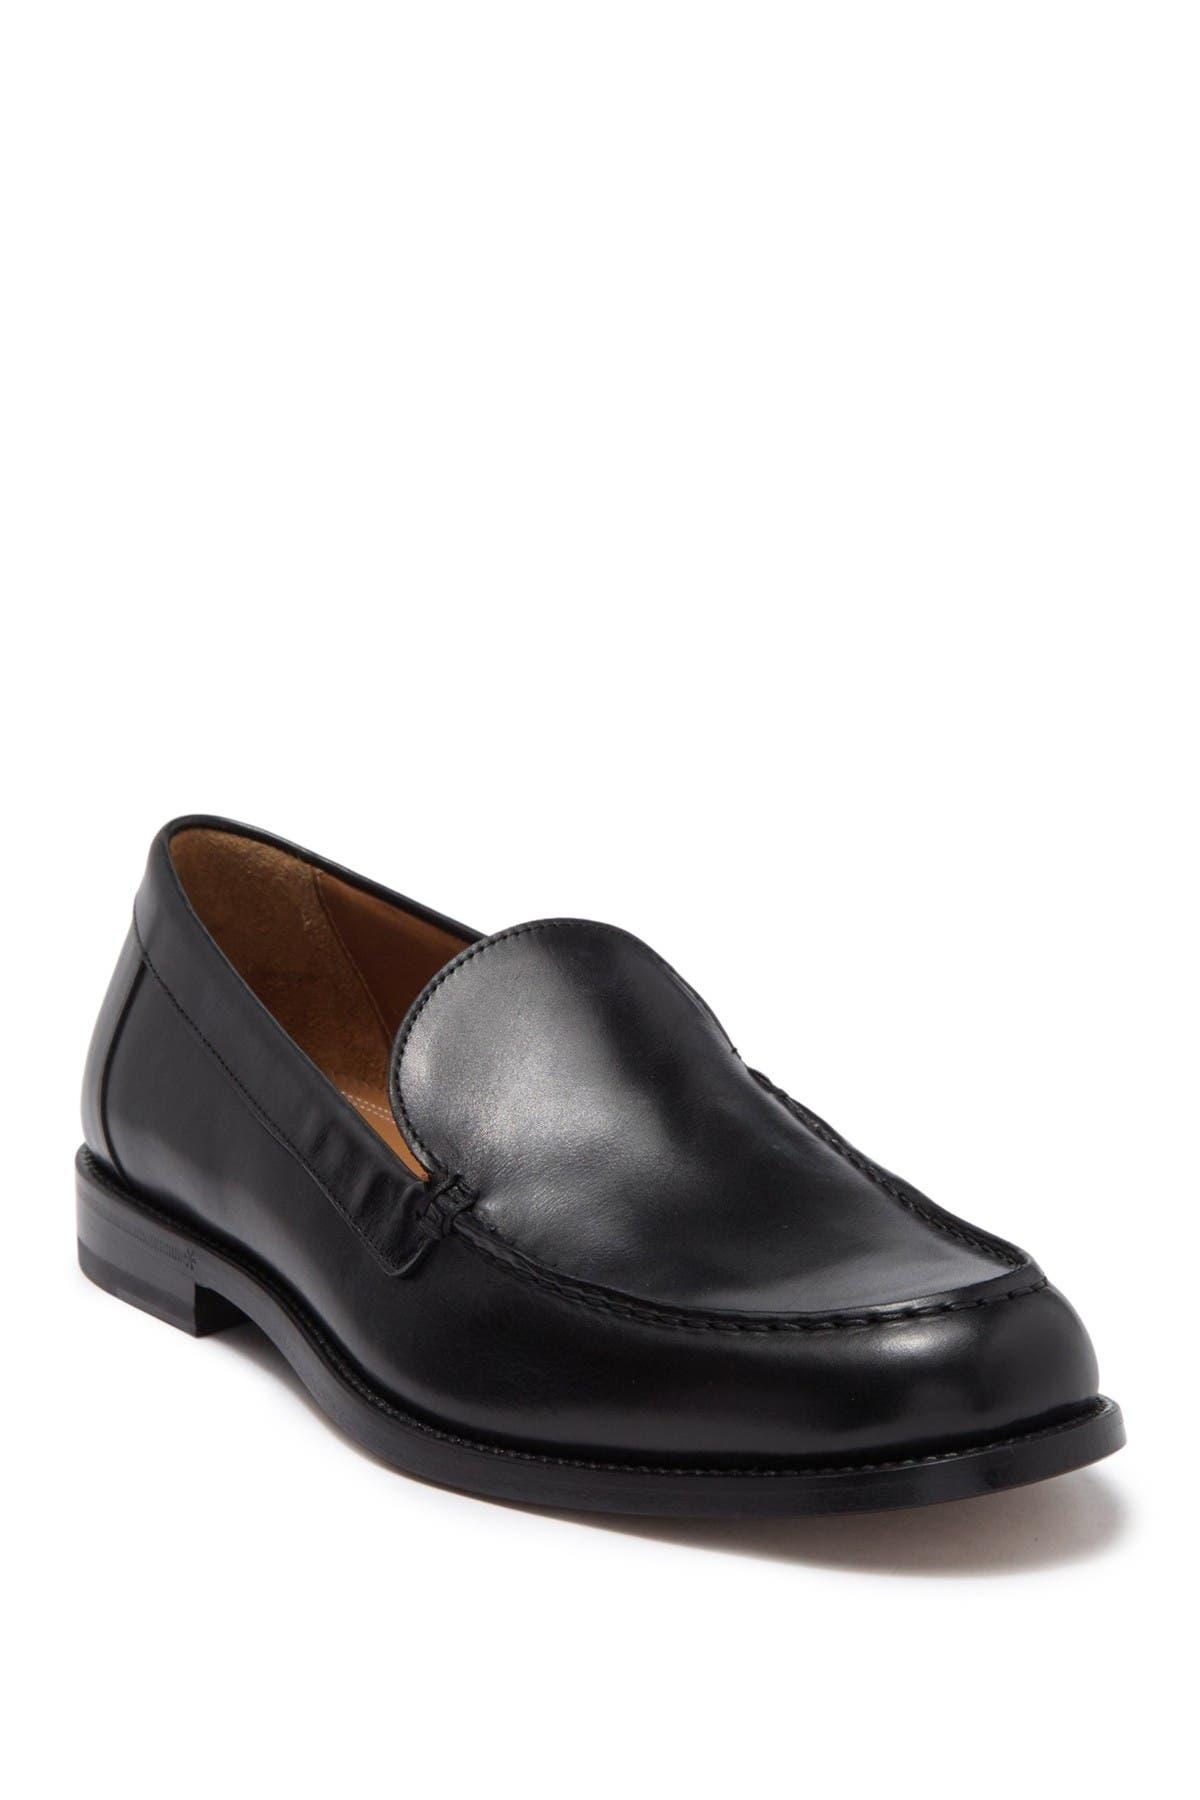 Image of Antonio Maurizi Leather Venetian Loafer